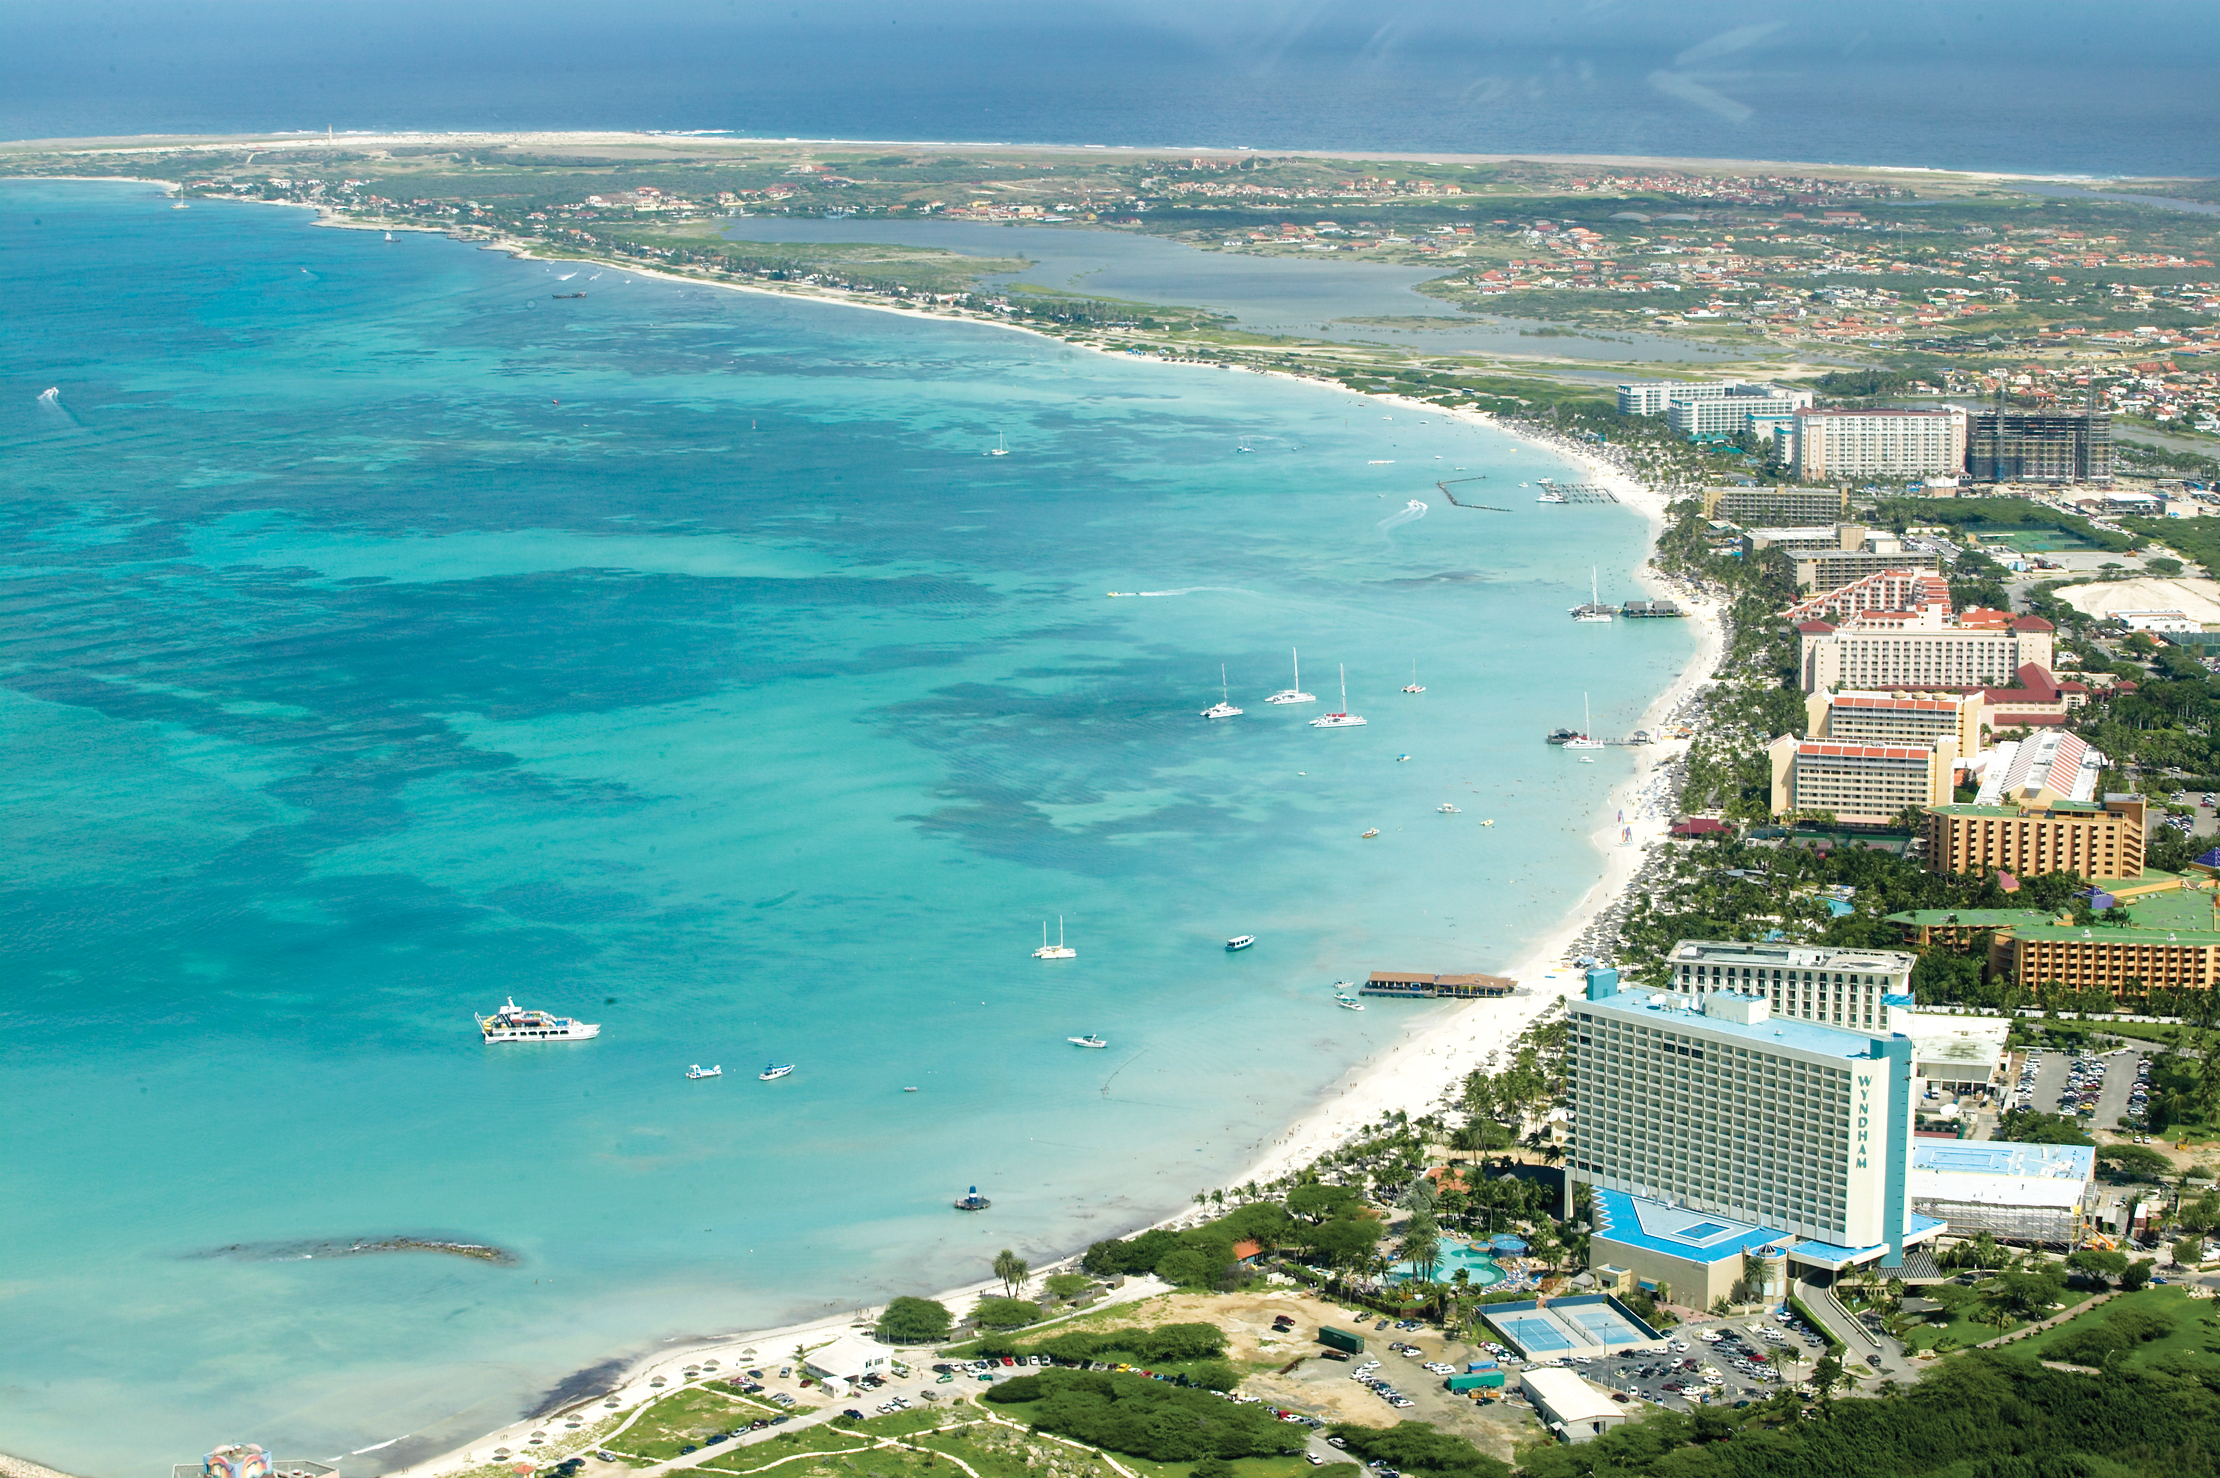 High-rise resorts line the Palm Beach area along the Aruba coastline.